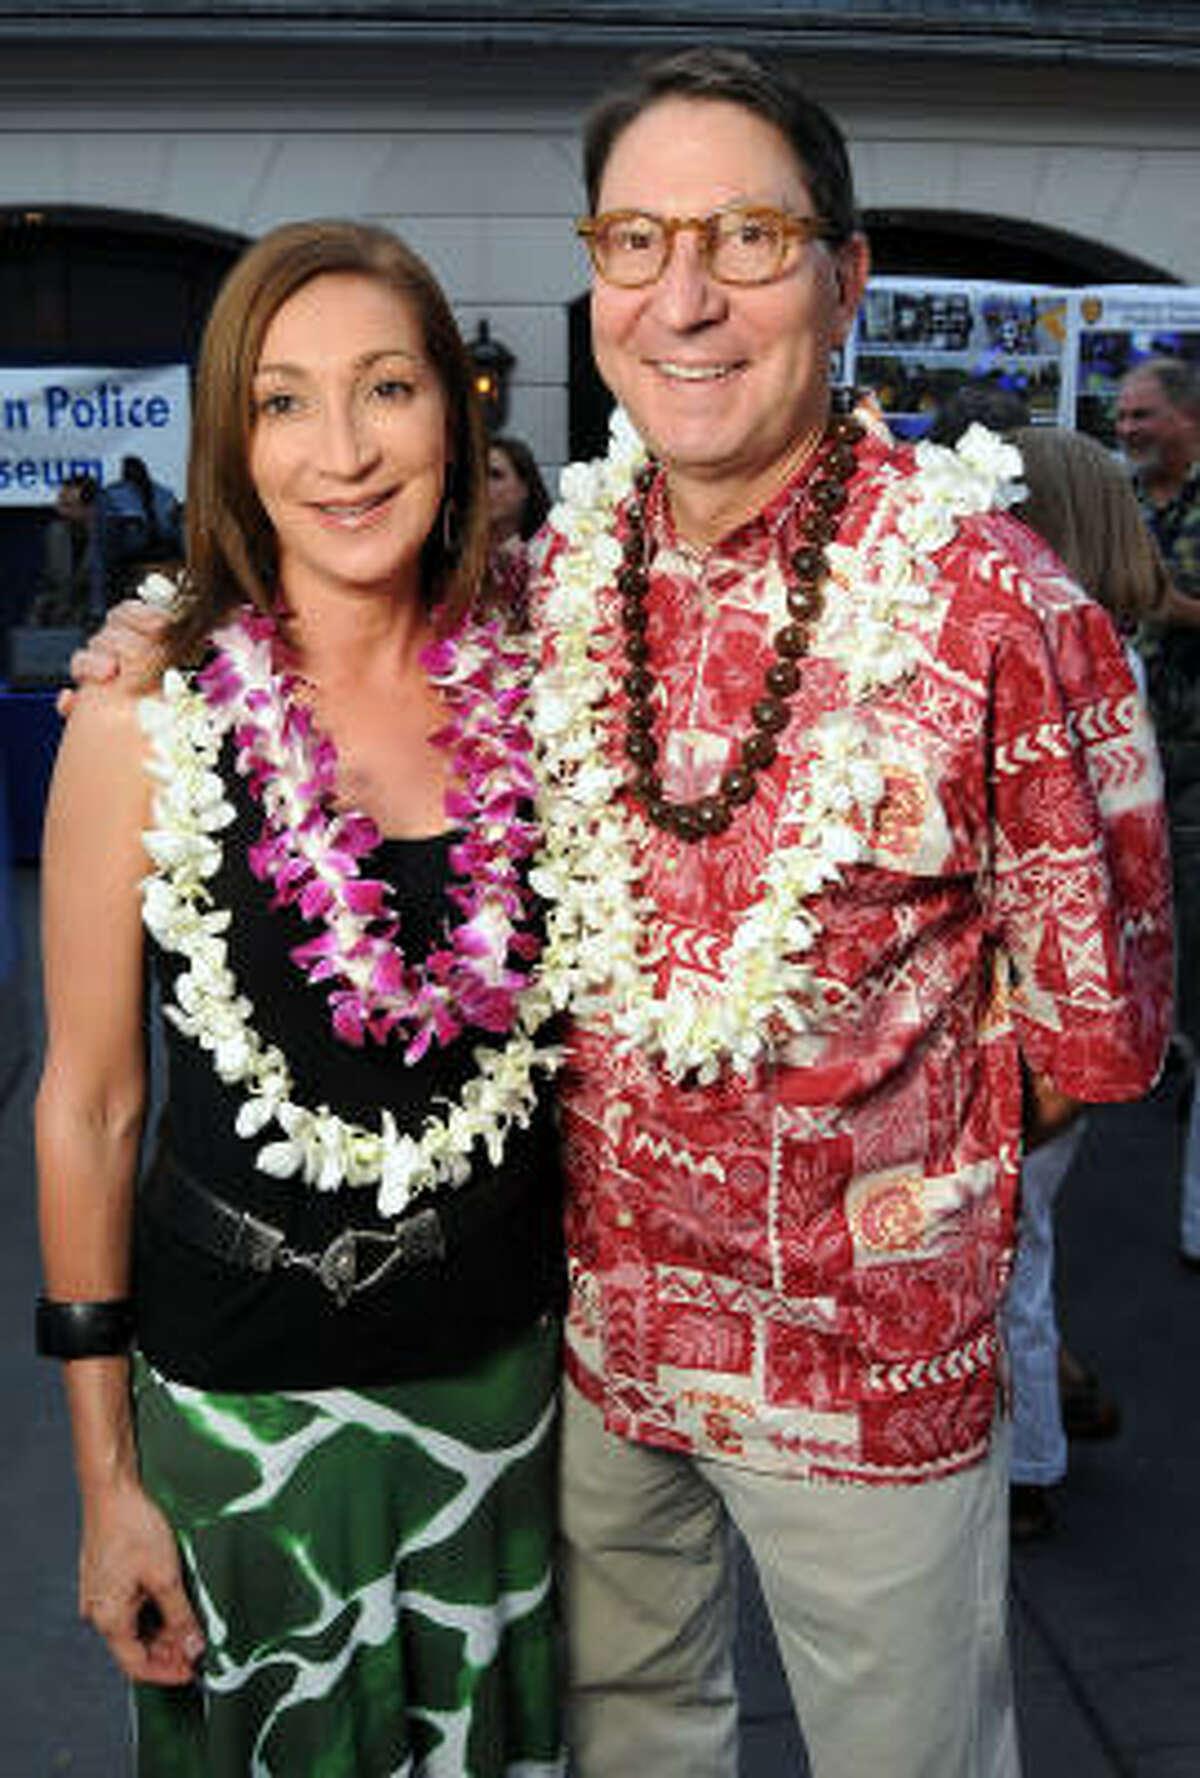 Soraya and Scott McClelland